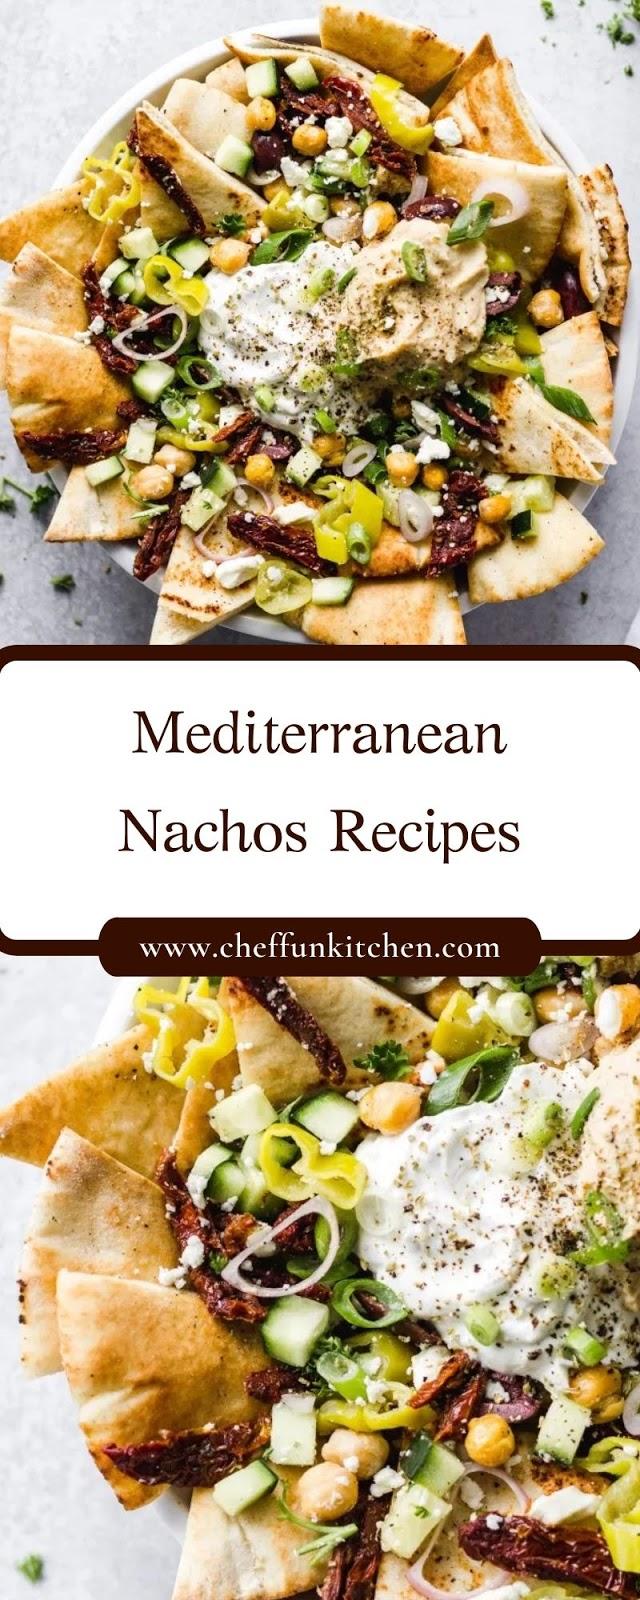 Mediterranean Nachos Recipes